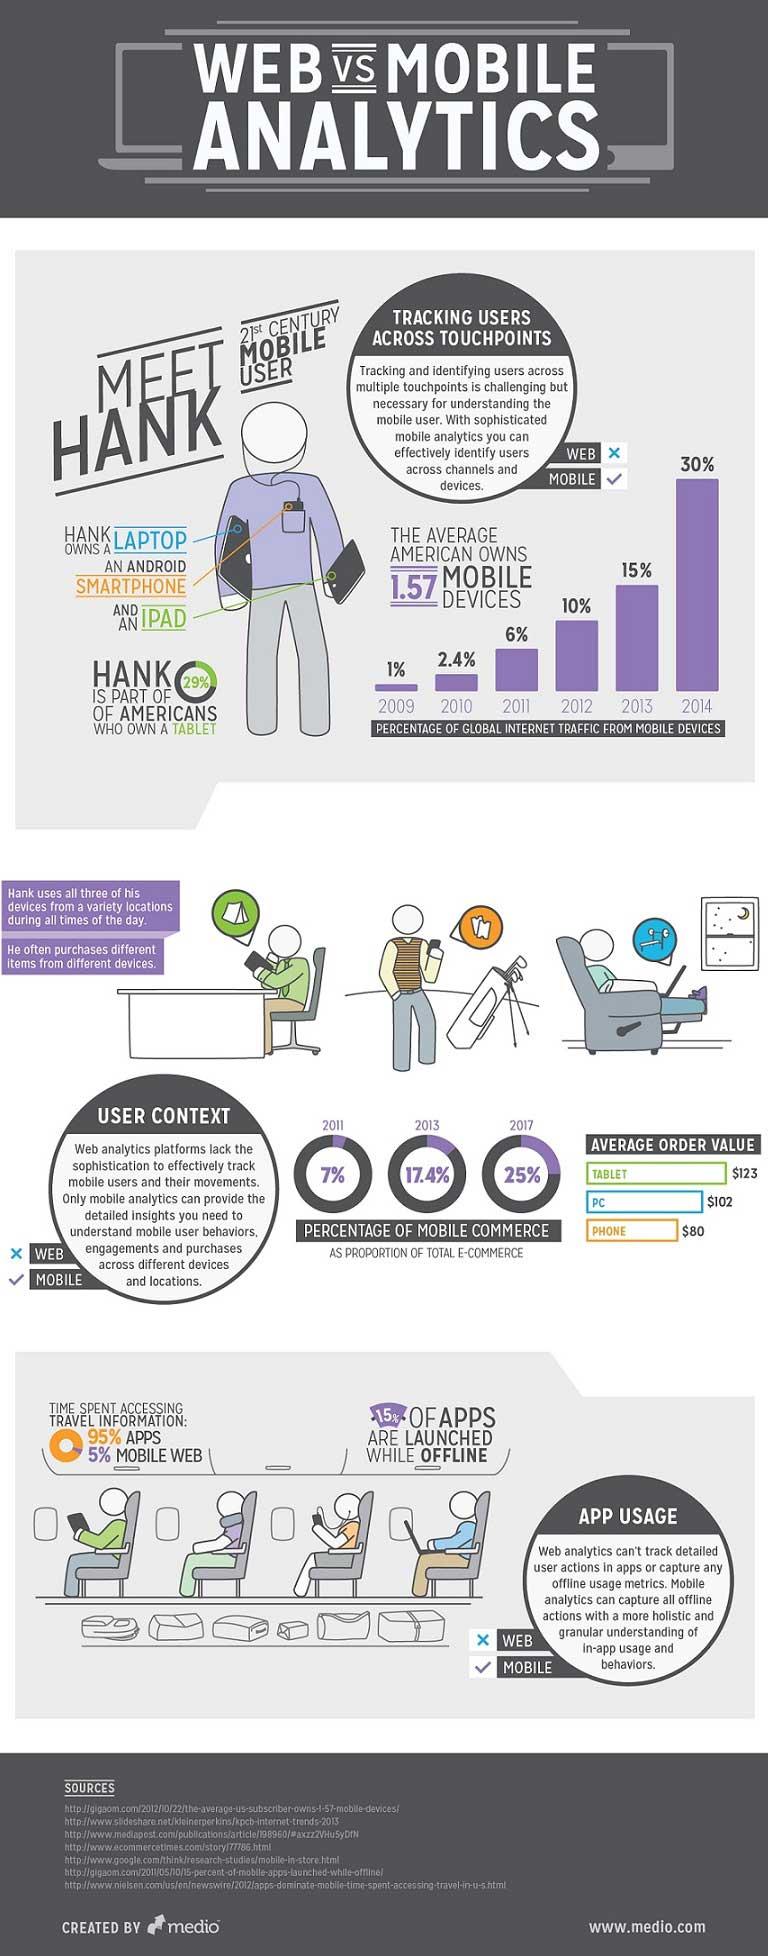 Web Versus Mobile Analytics